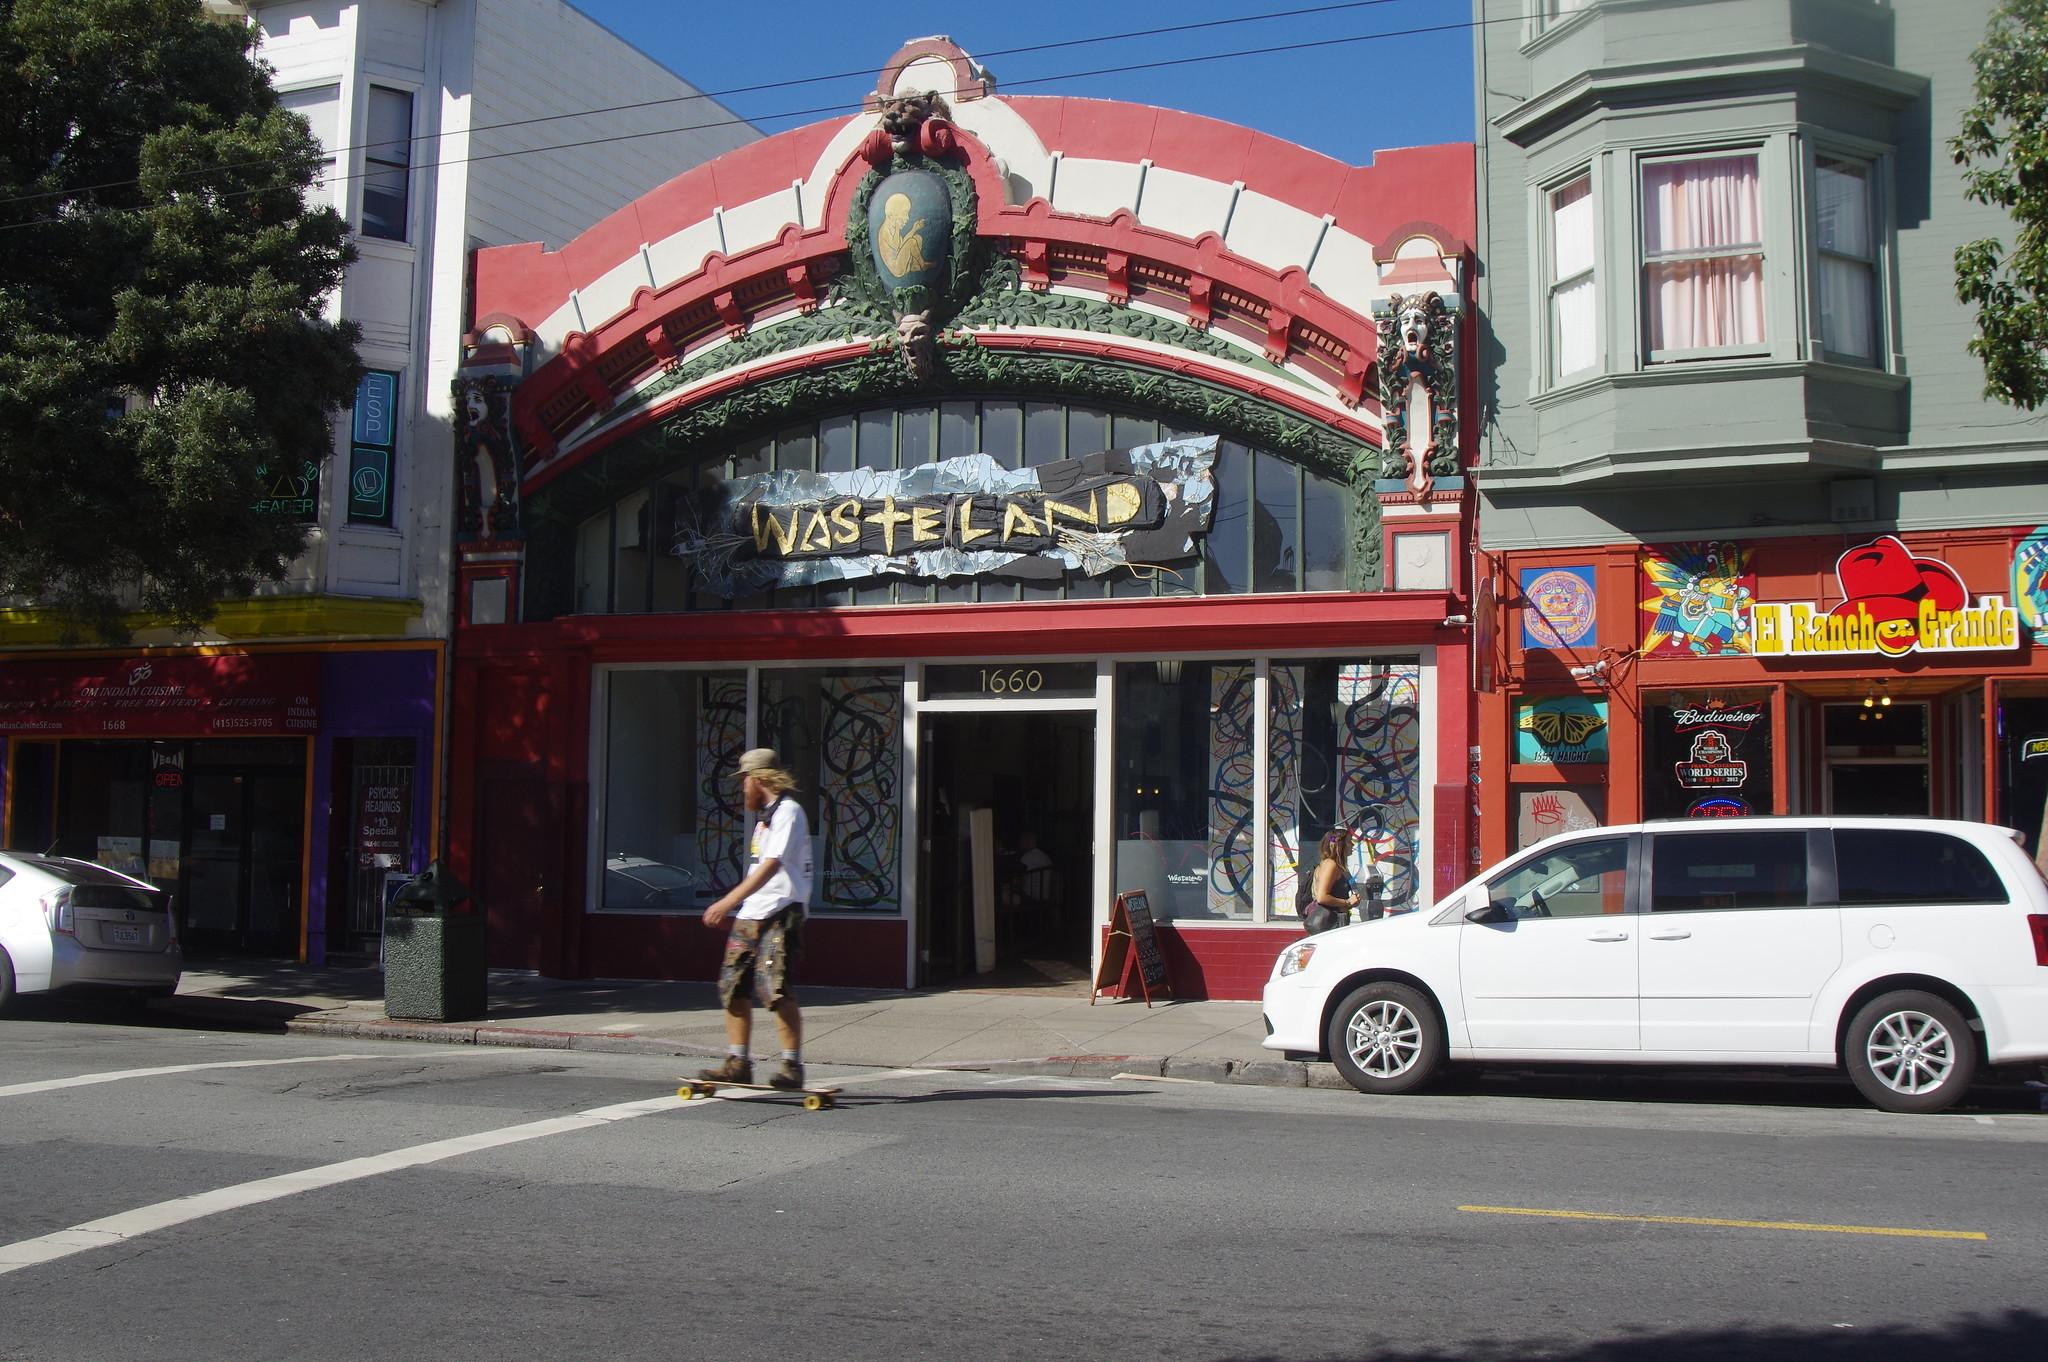 Wasteland San Francisco